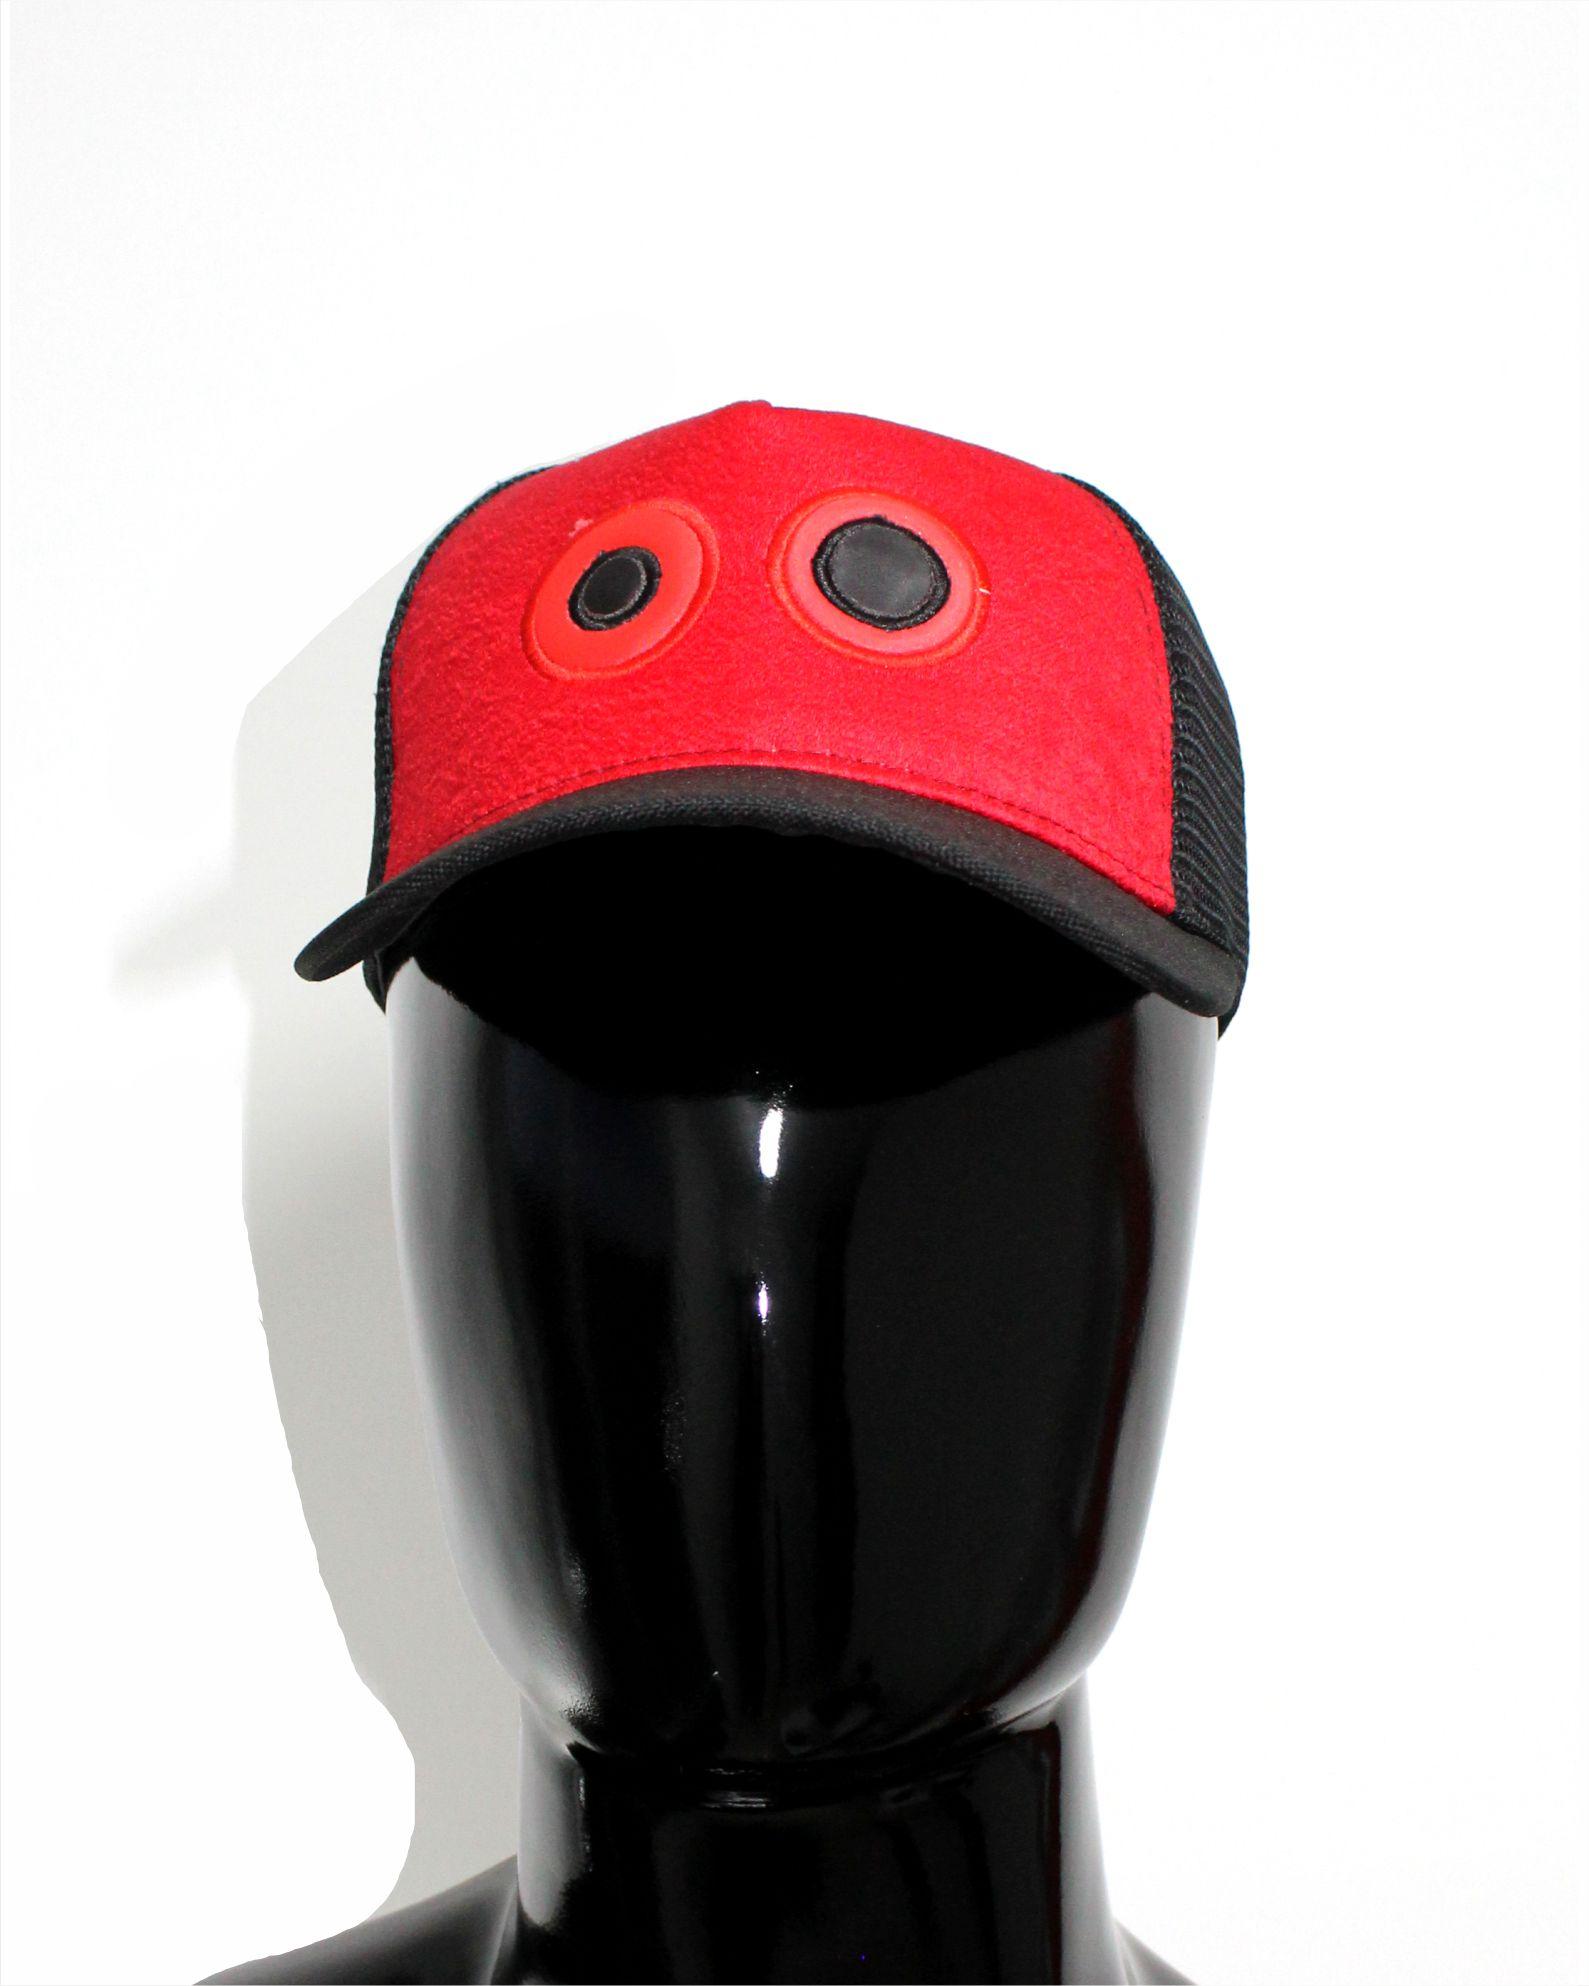 ref 1762 01 Gorra lona rojo visera negro, con maya negra ojos bordados grandes $37.000 talla unica